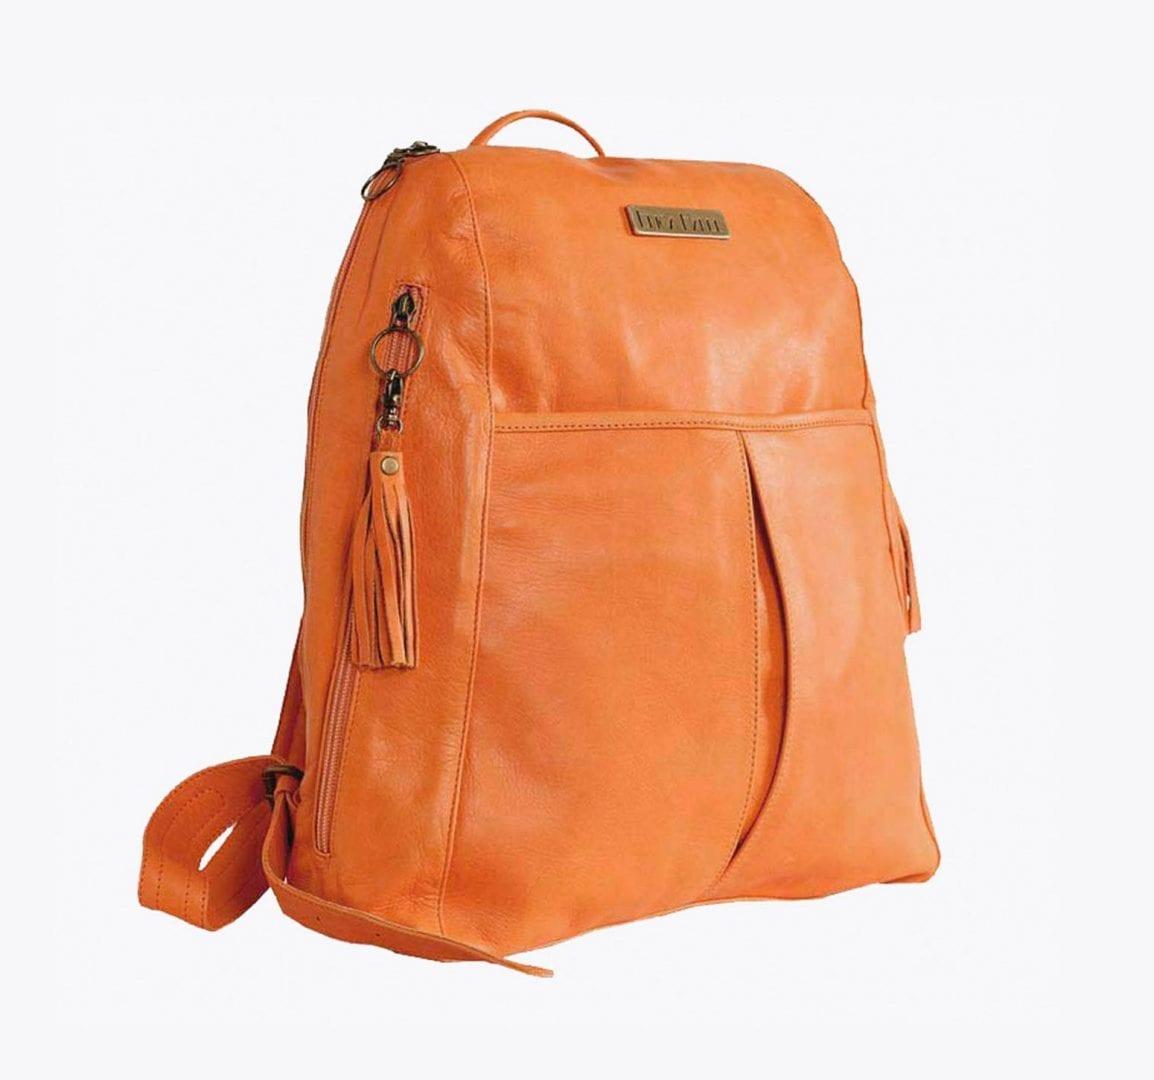 Womens Leather Backpacks | Mens Backpacks | Leather Purses